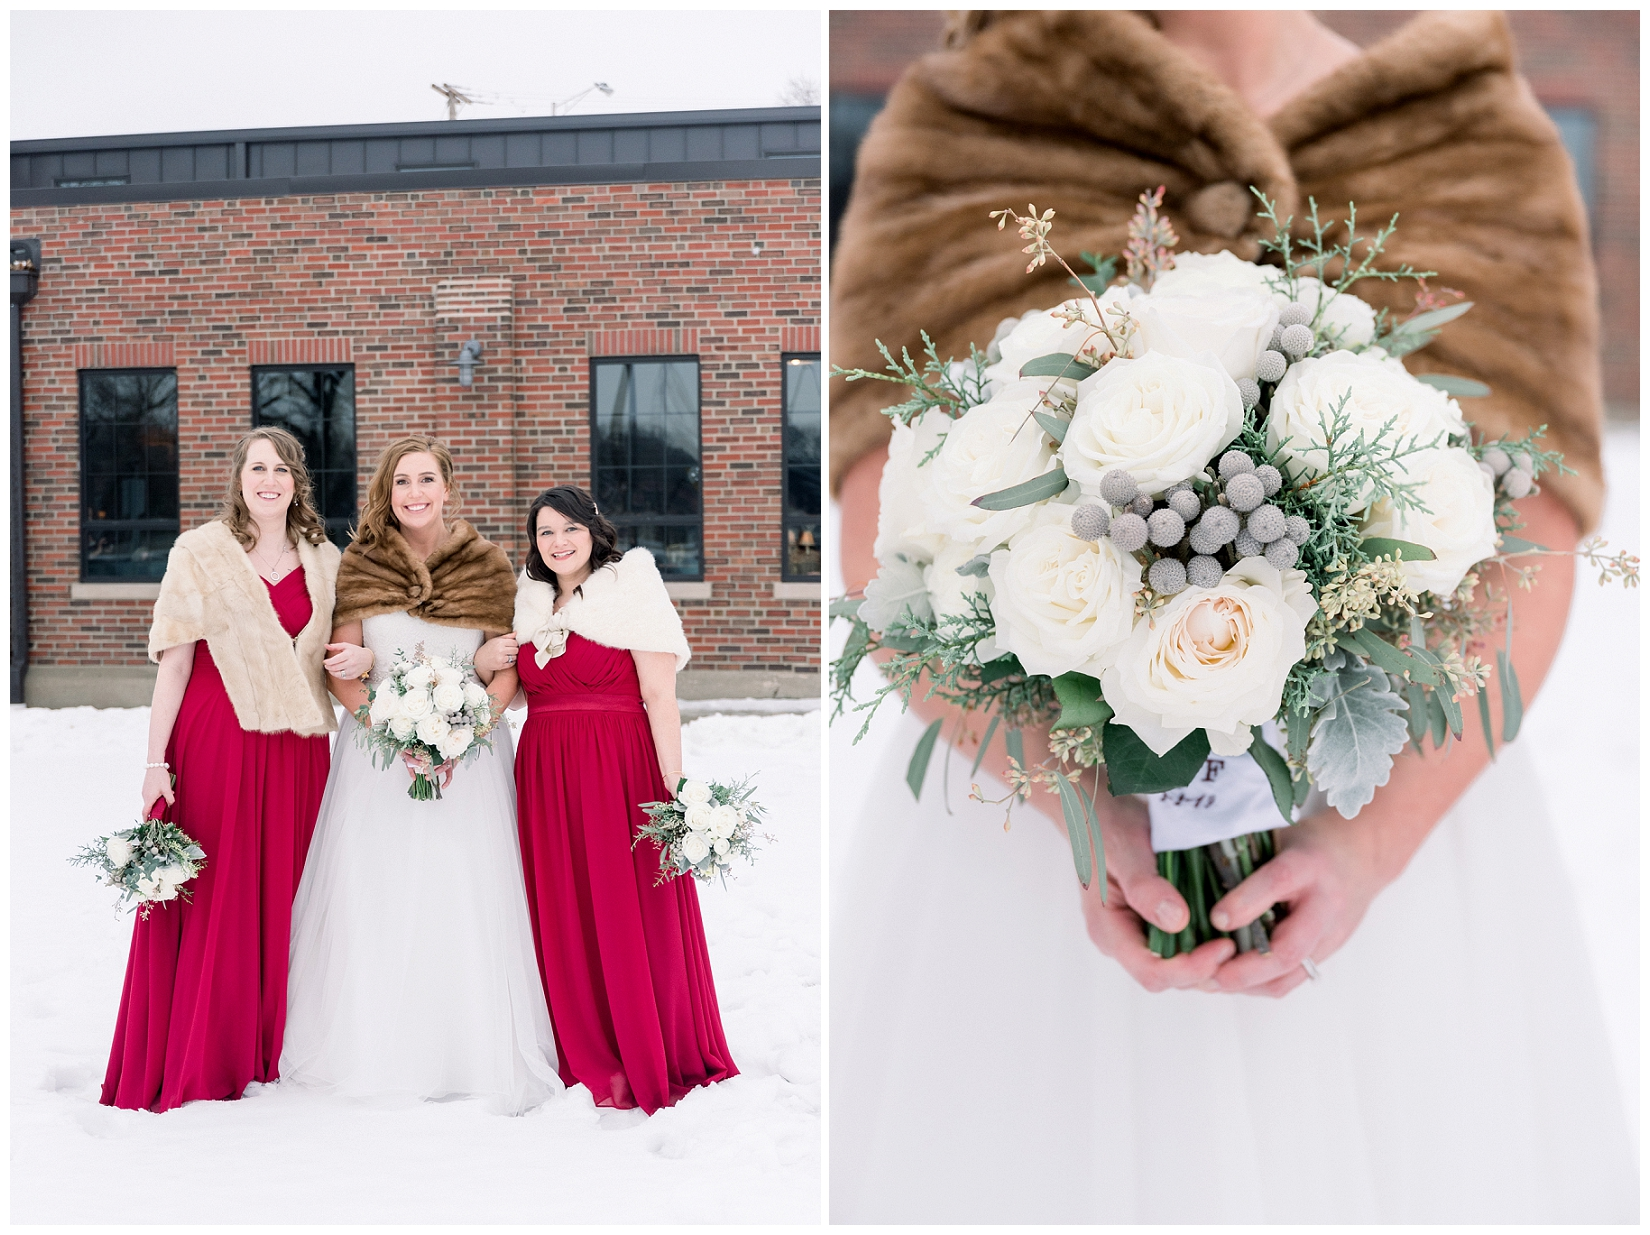 cat-alkire-wedding-photographer-indiana-chicago-indianapolis-fort-wayne_0961.jpg